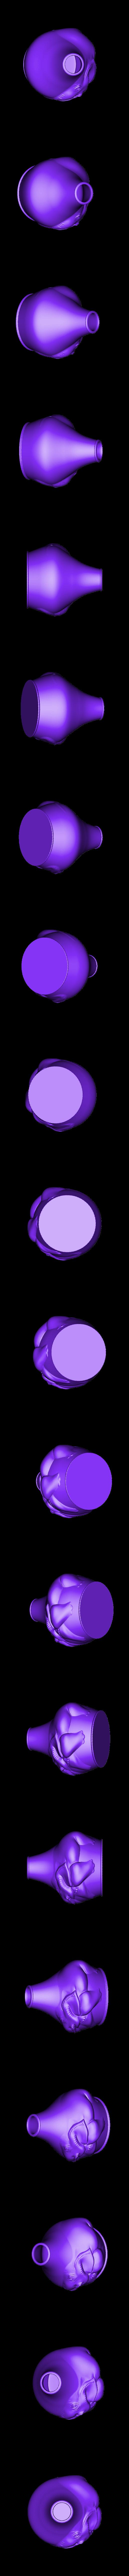 vase elephant modele 2 .stl Télécharger fichier STL X86 Mini vase collection  • Objet imprimable en 3D, motek